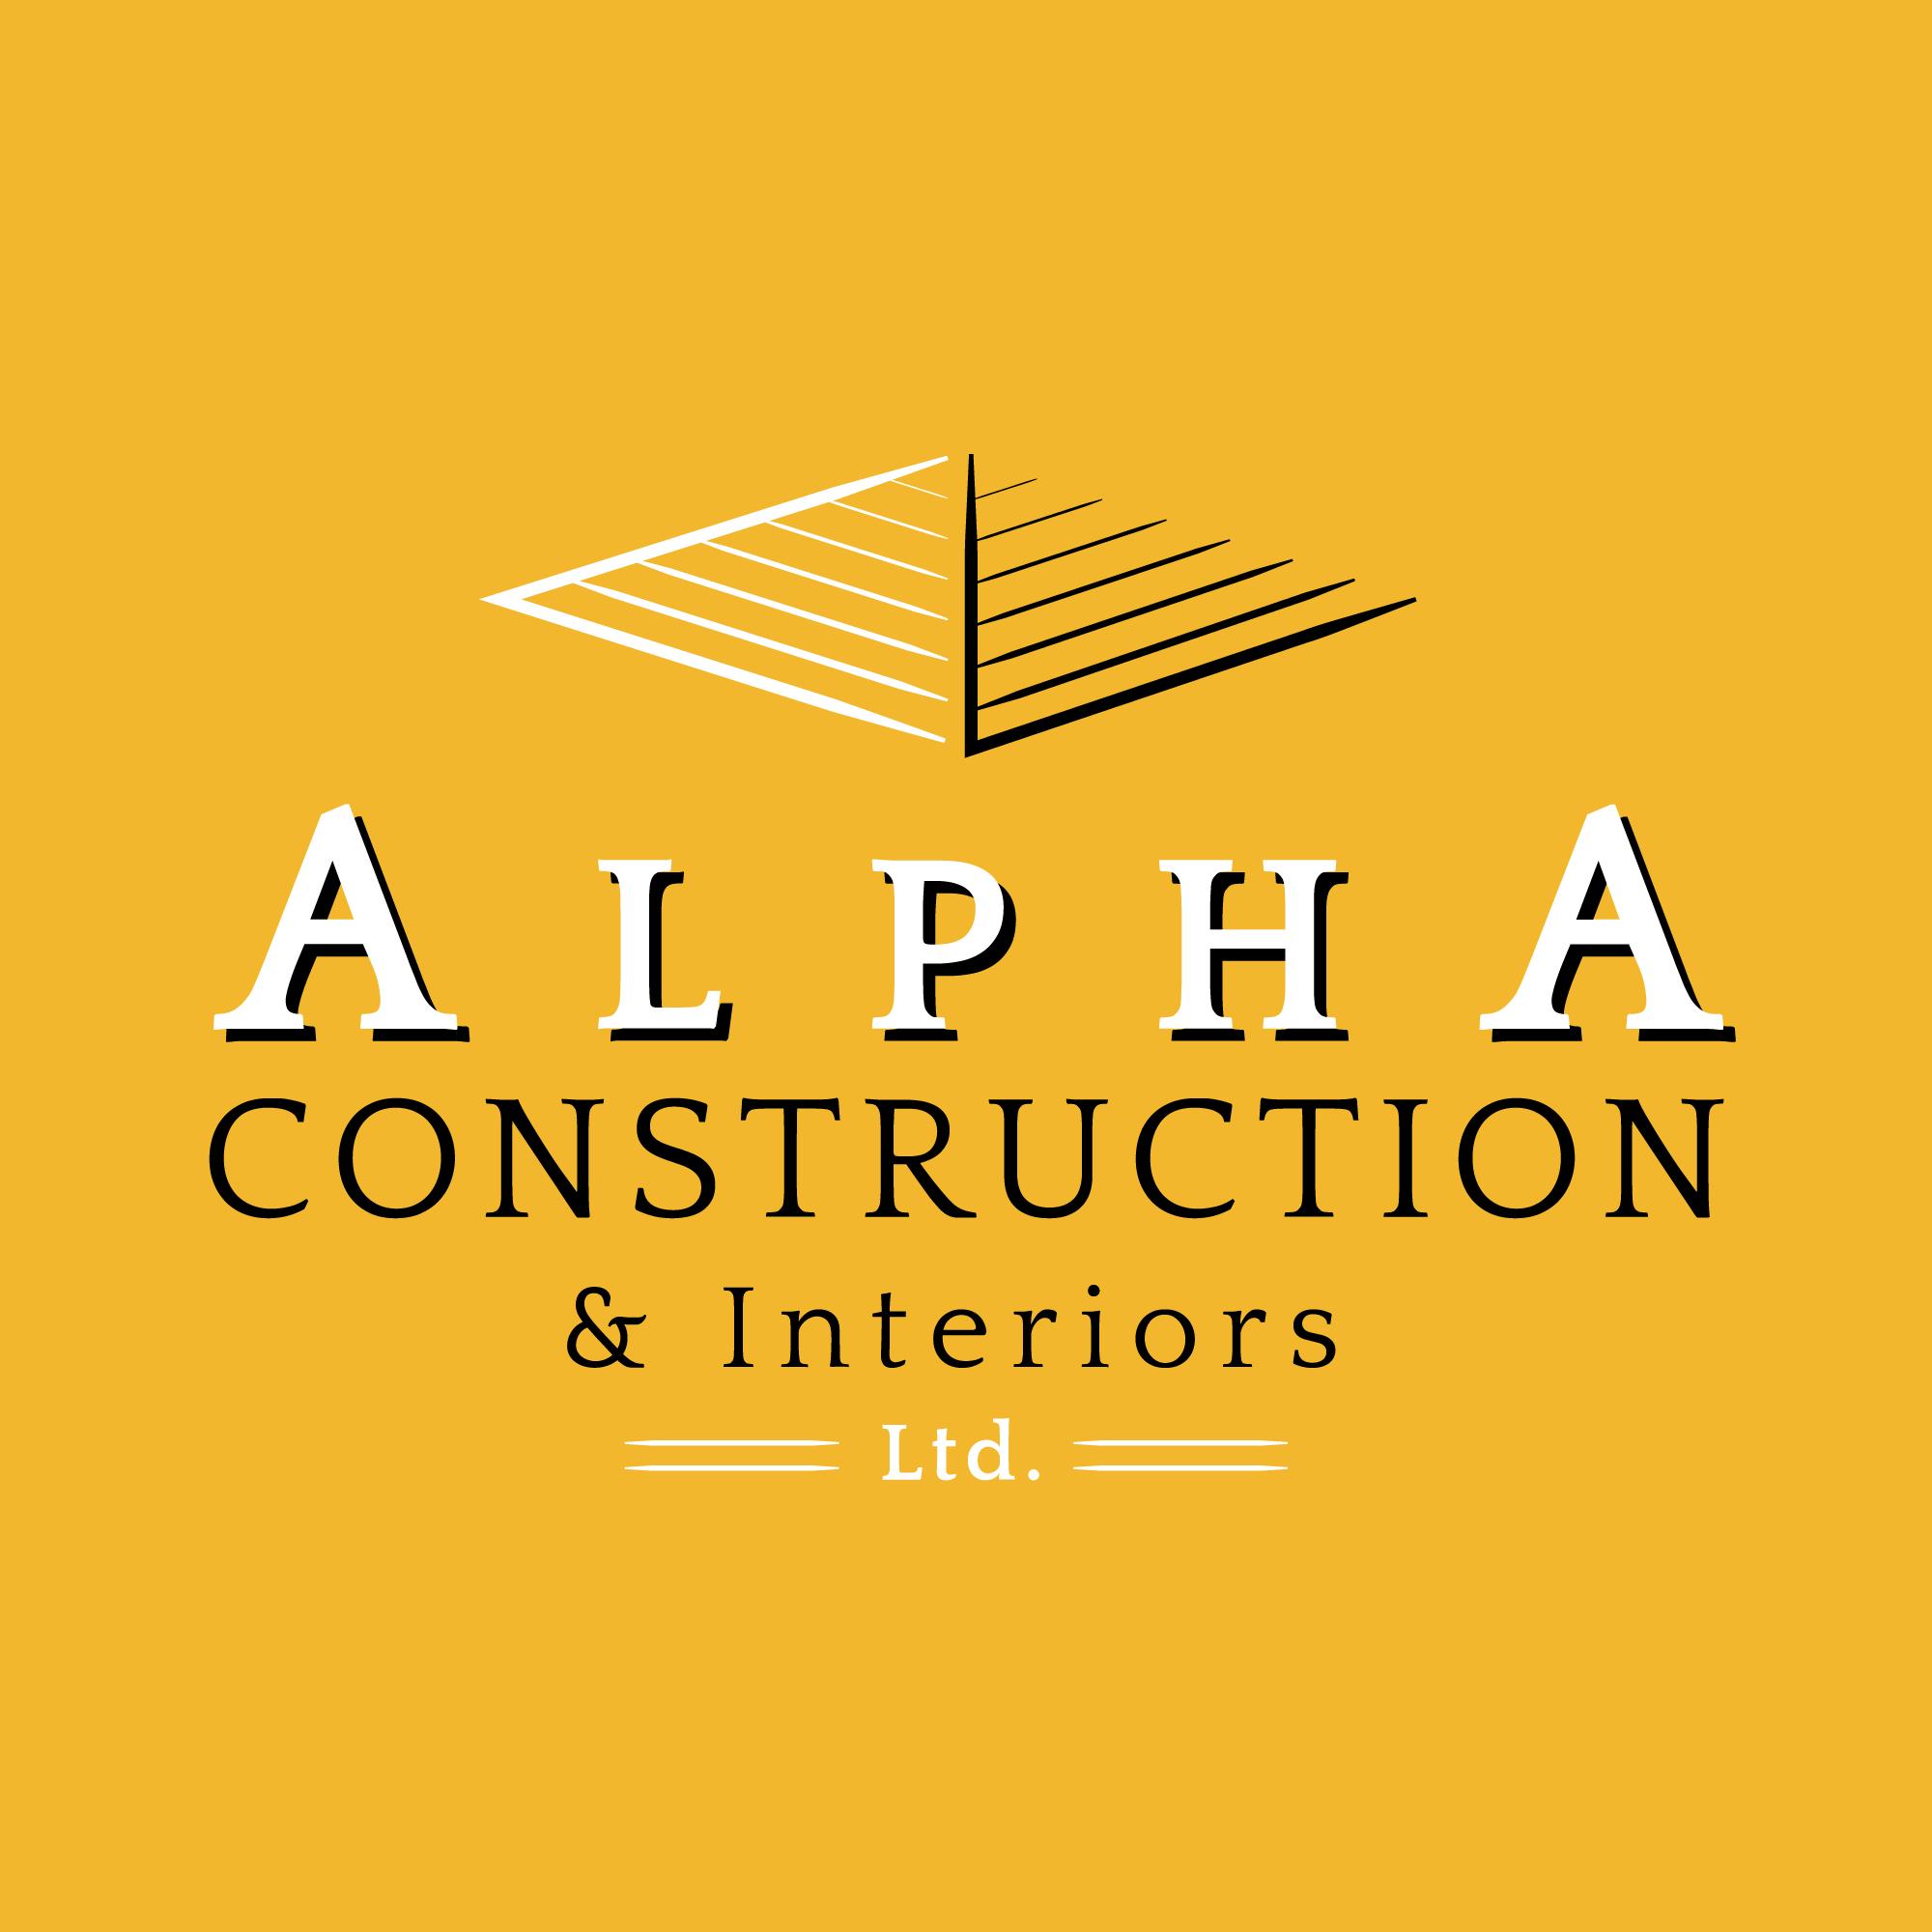 Alpha-contstruction-logo-001